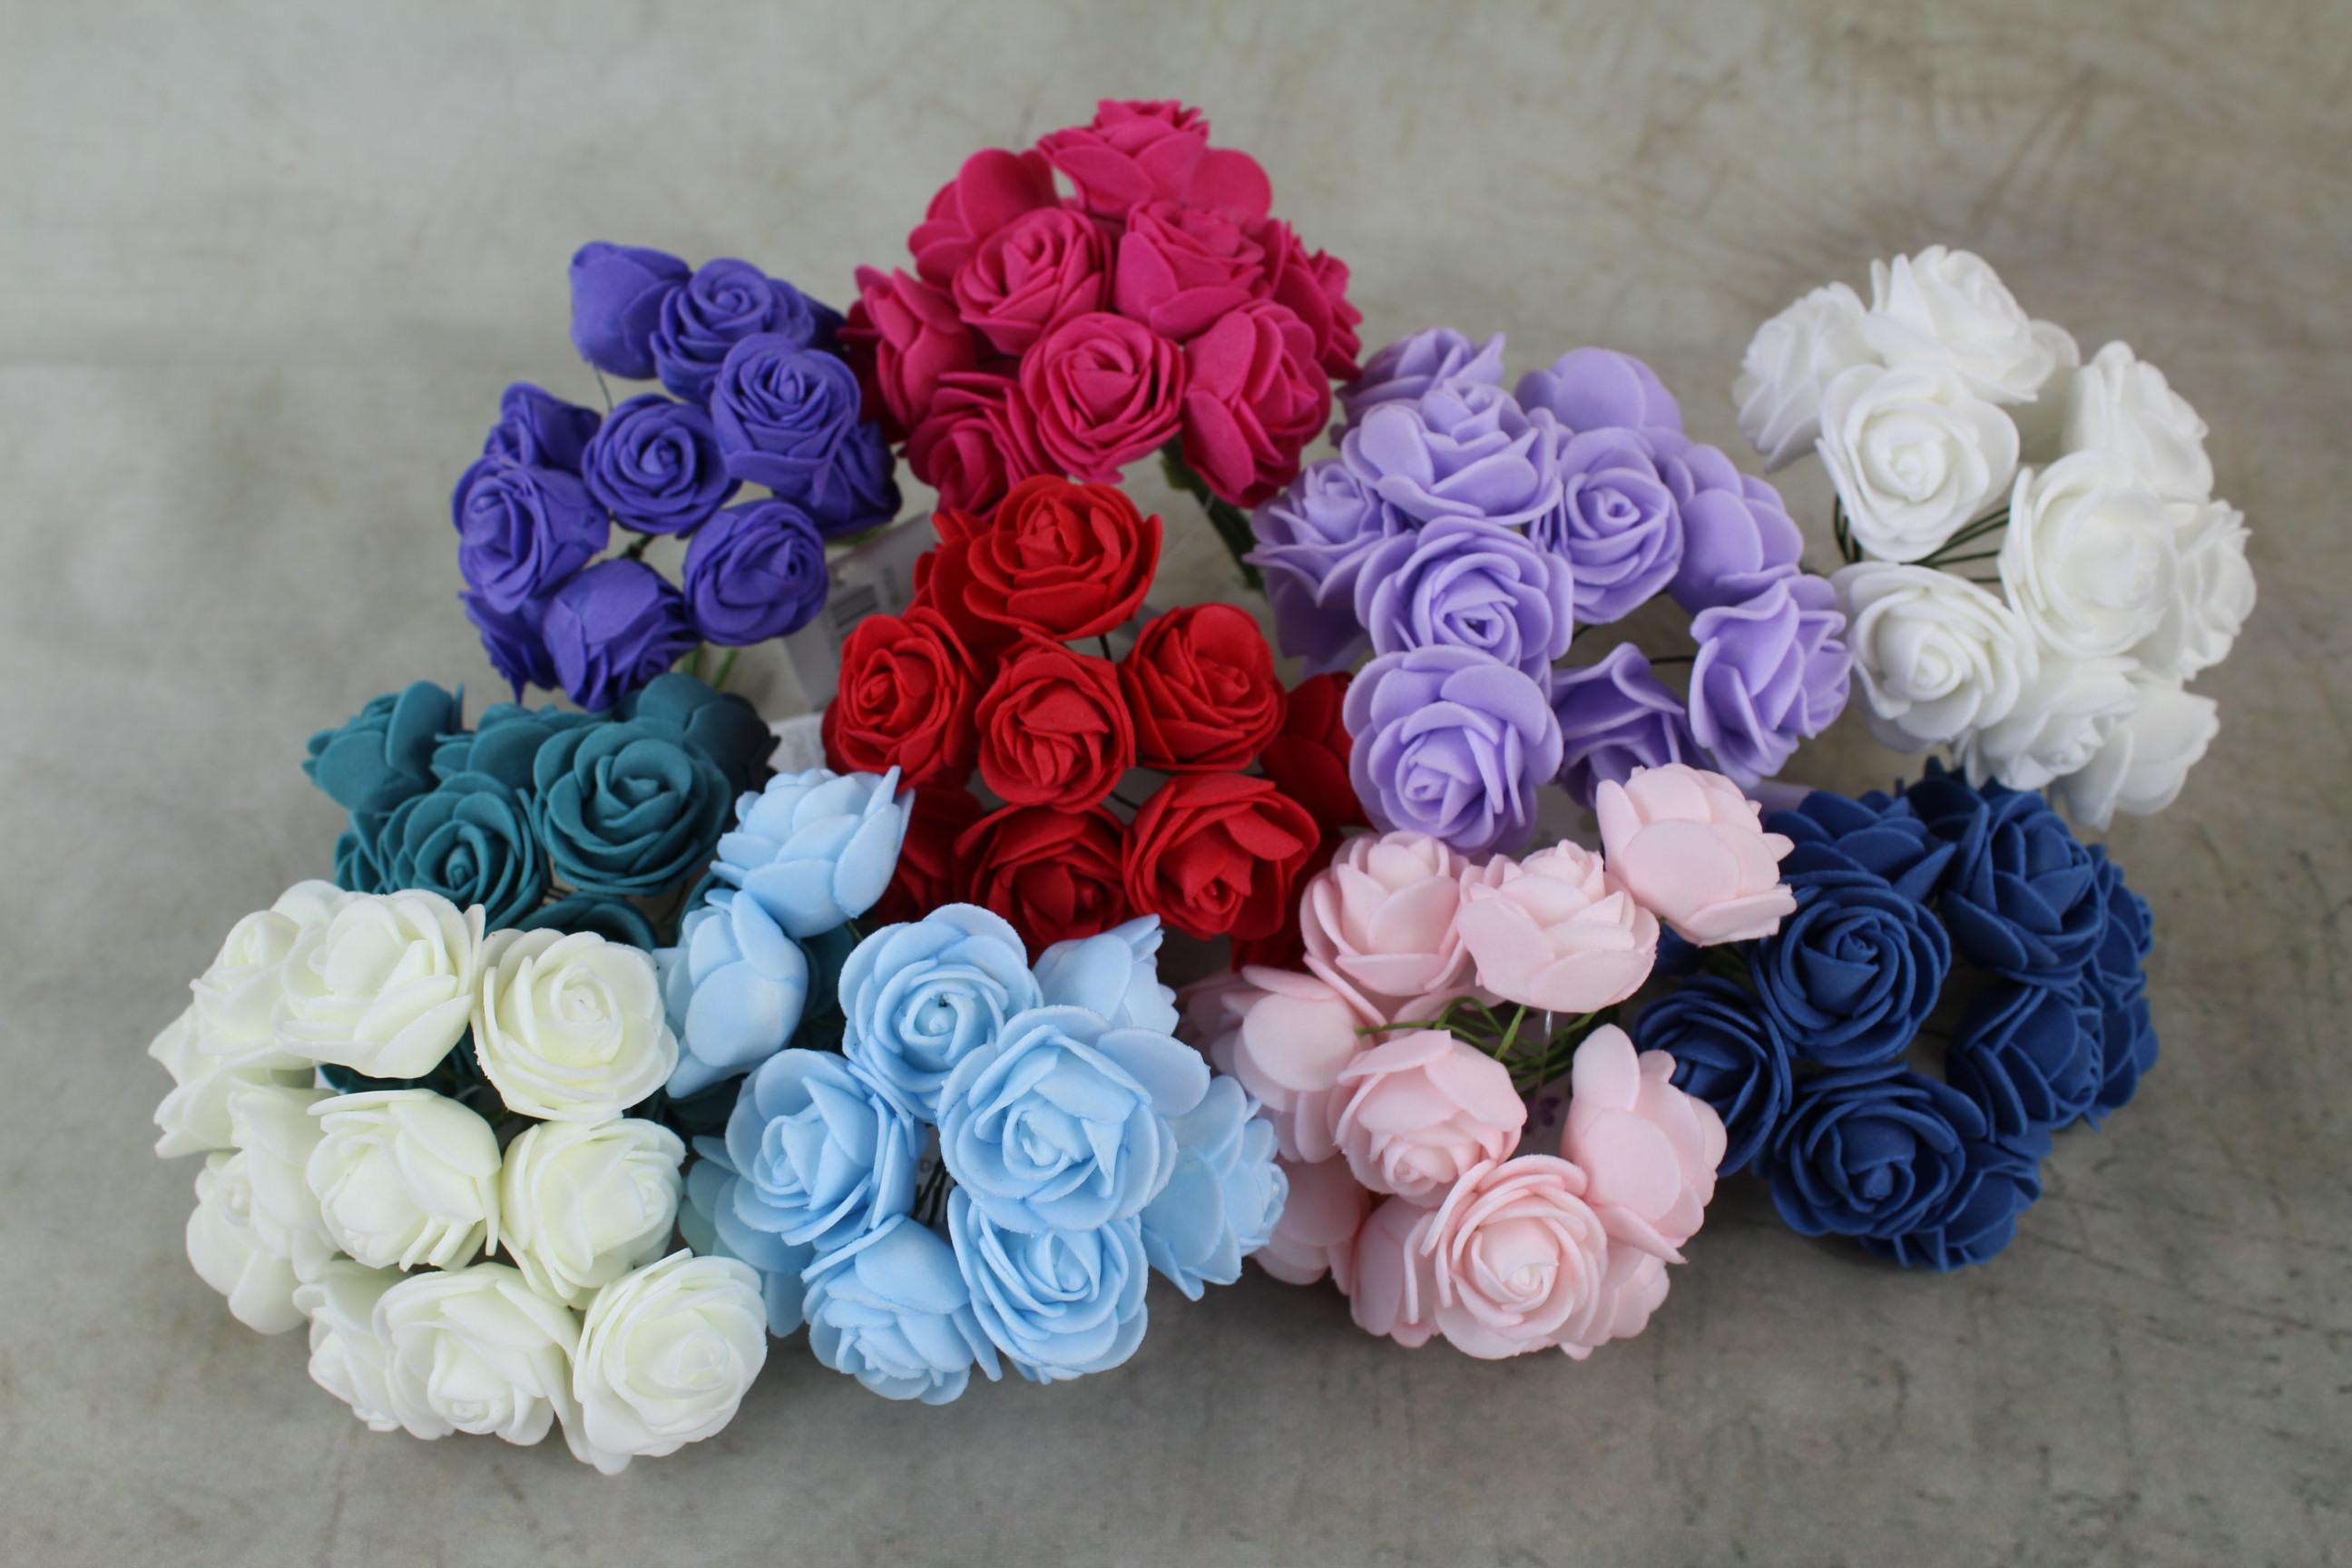 12 x 2.5cm Foam Roses